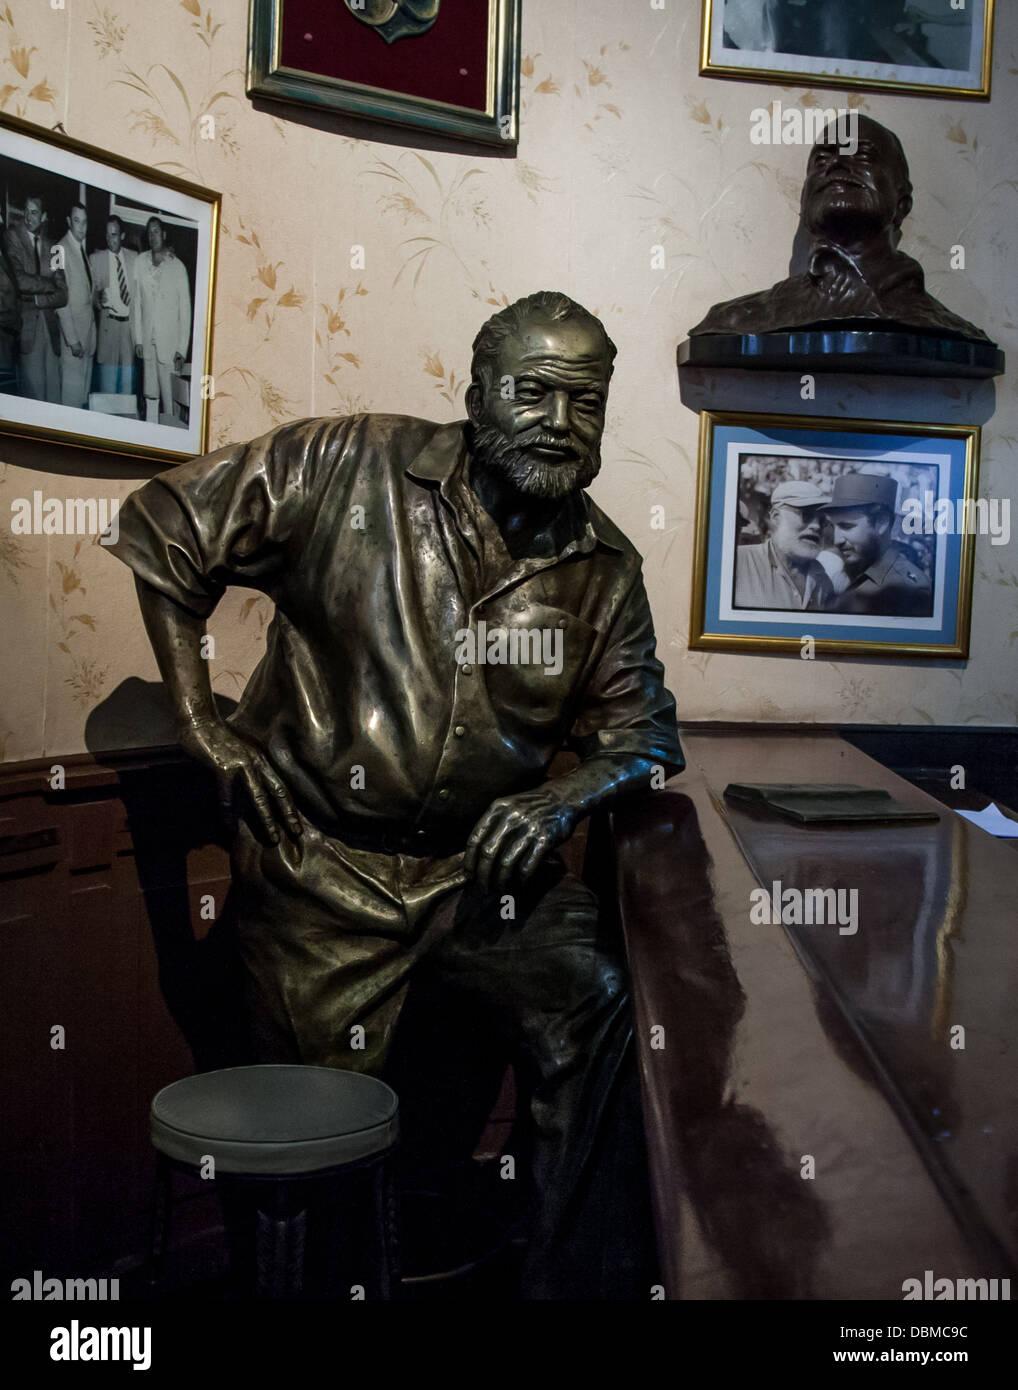 statue of Hemingway in Havana bar Stock Photo